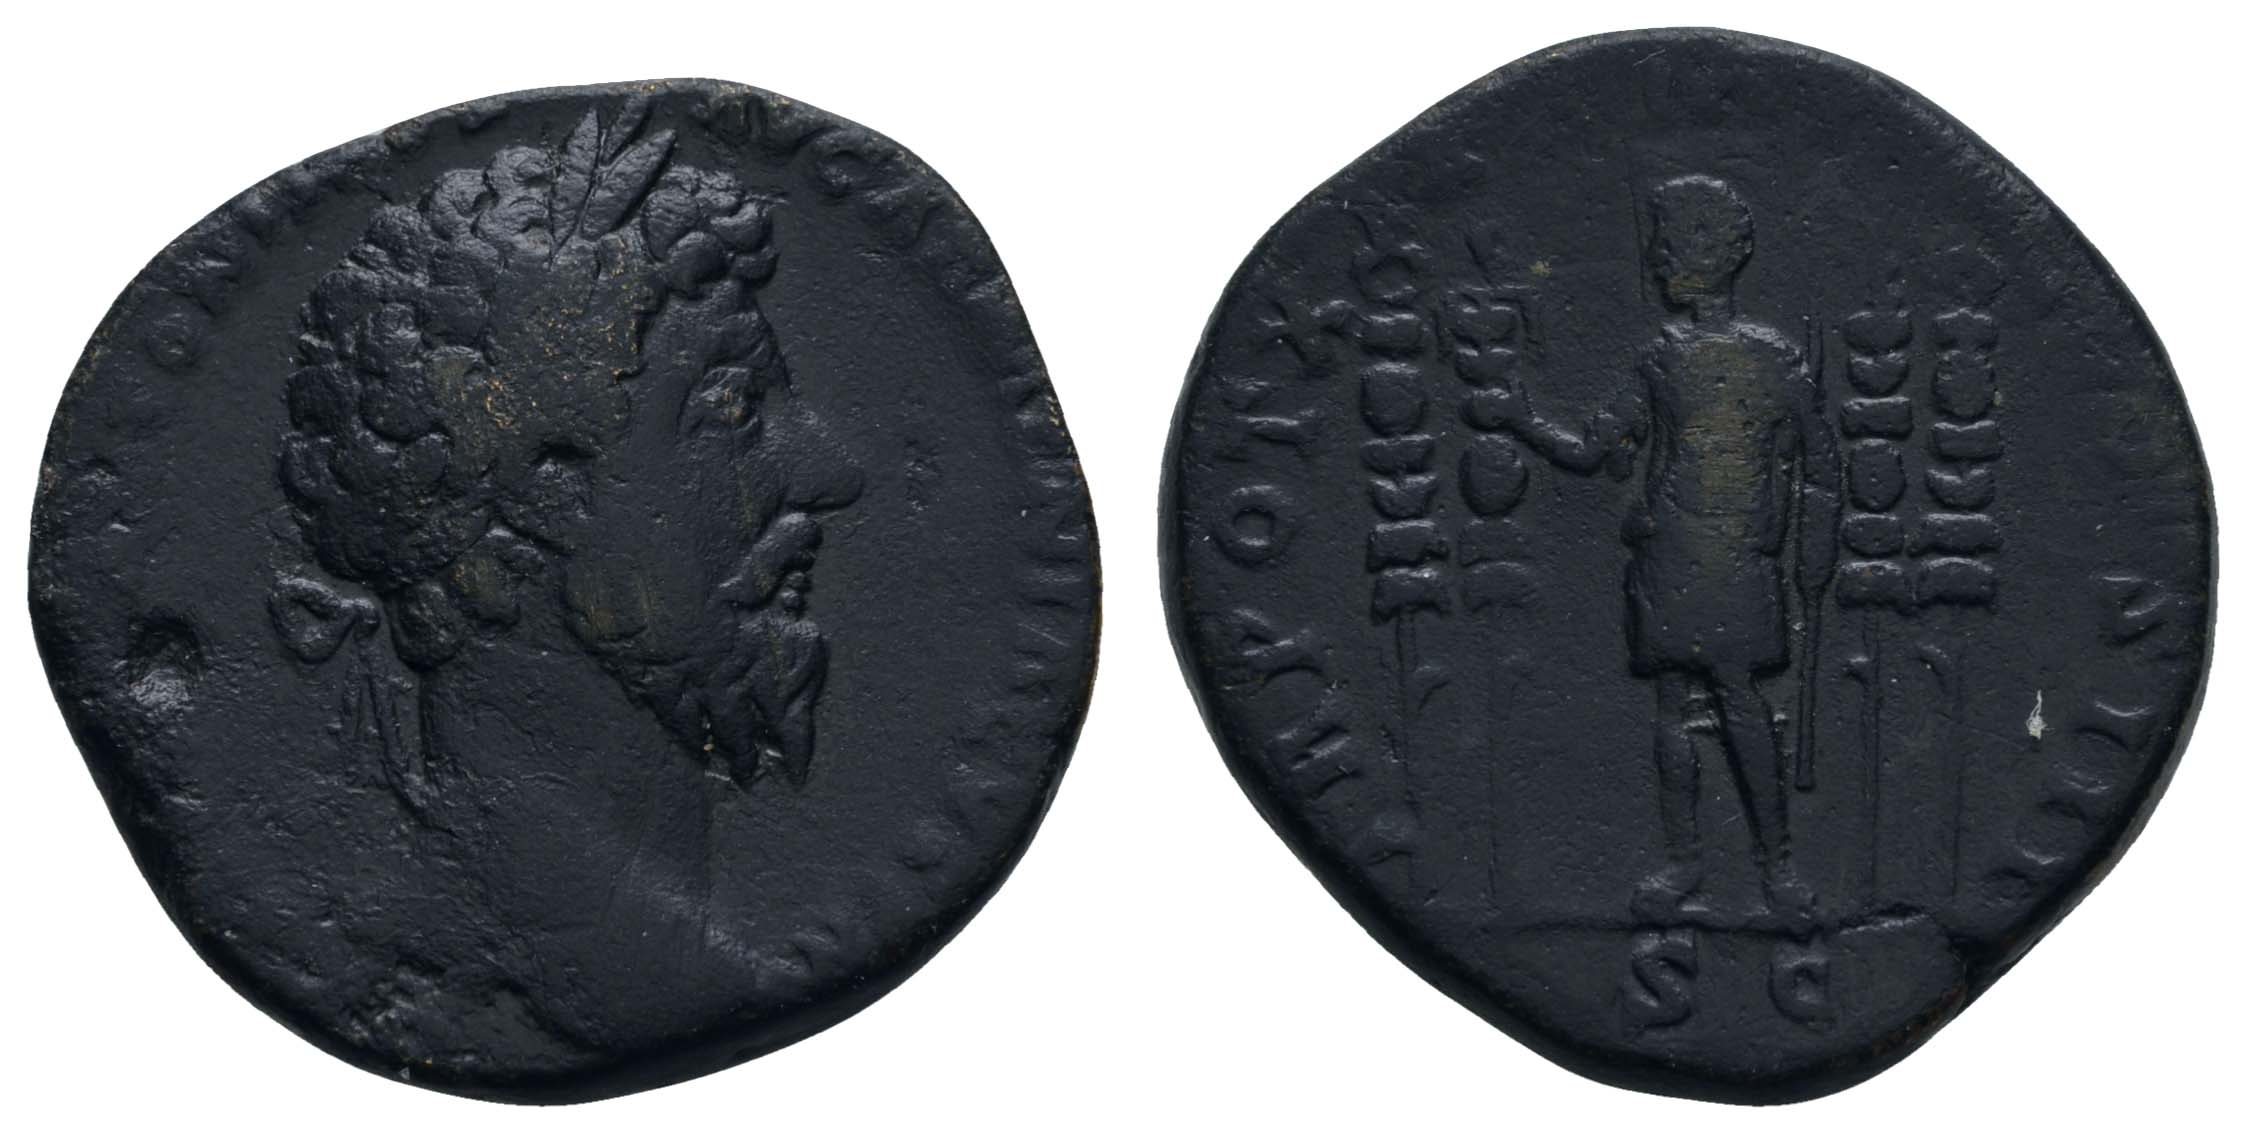 Lot 208 - Antike Römer - Kaiserzeit -  Auktionshaus Ulrich Felzmann GmbH & Co. KG Coins single lots